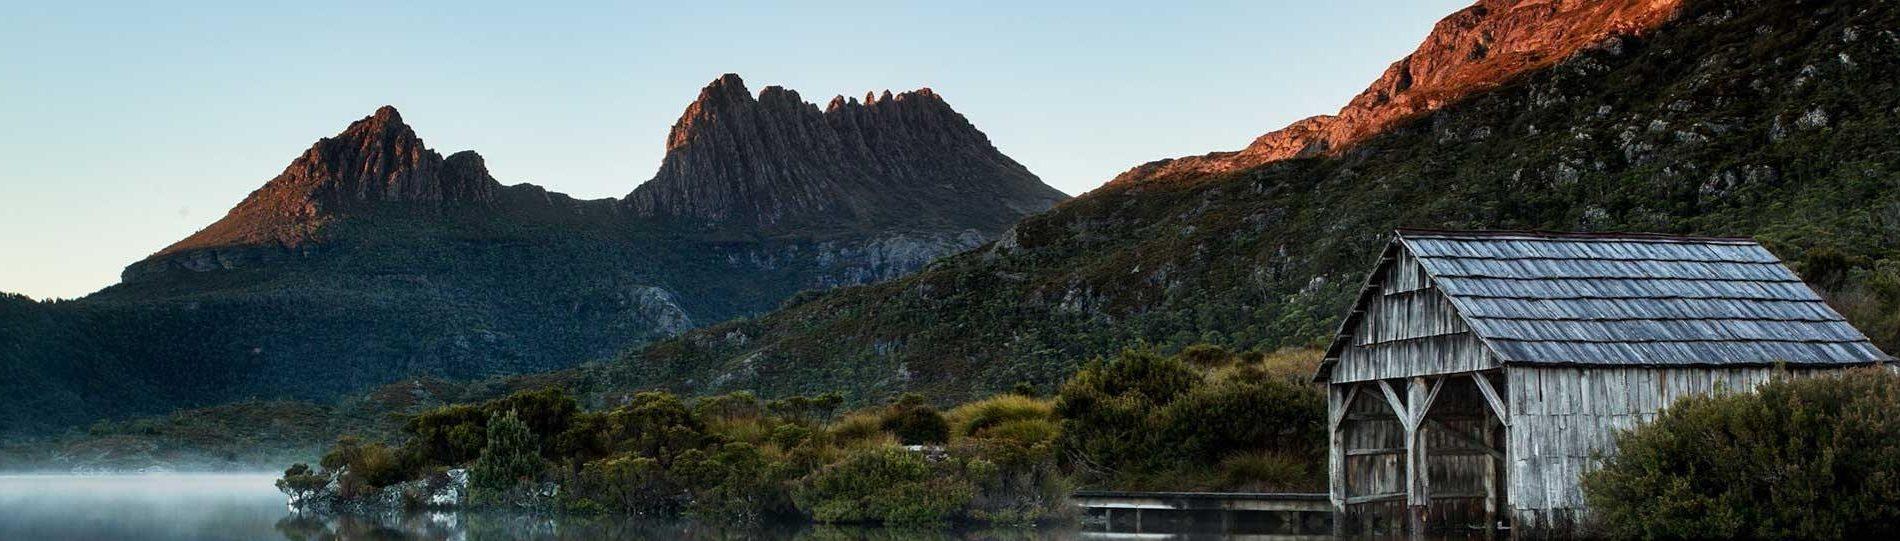 hobart attractions cradle mountain